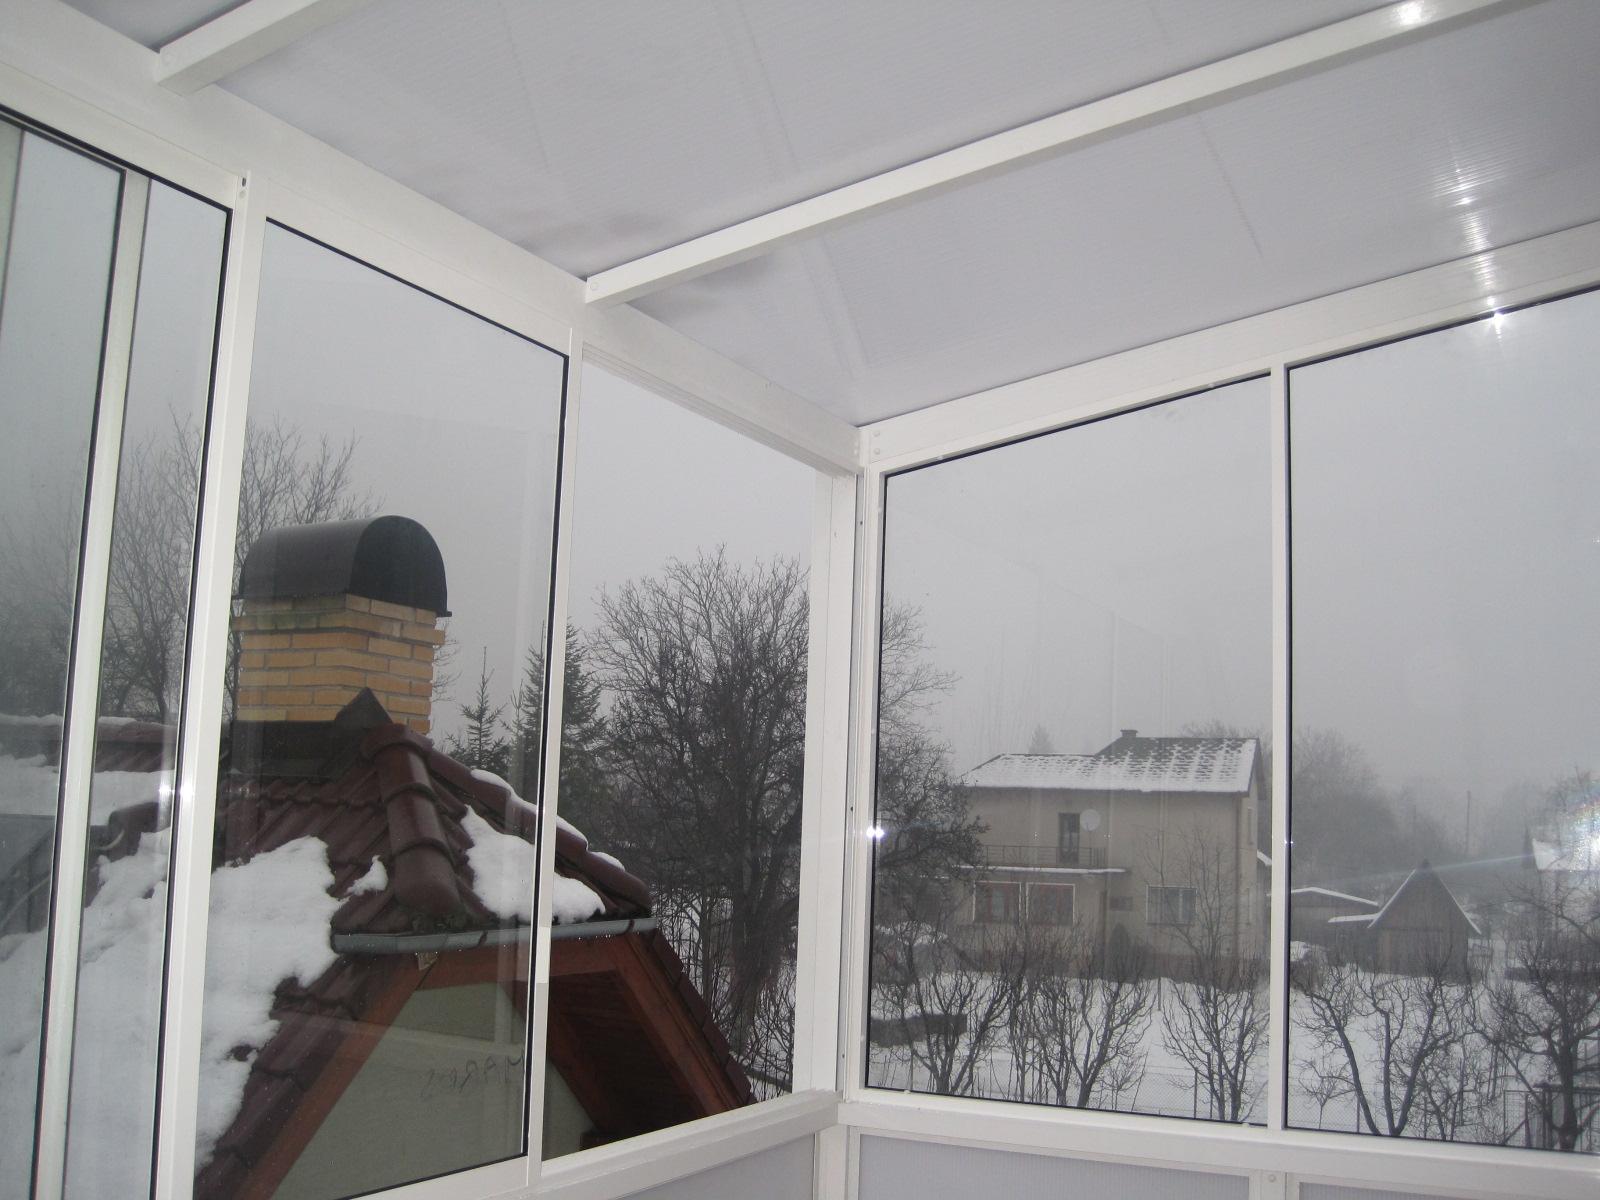 Design#5001161: Verglasung der terrasse - koseca-ilava - pifema s.r.o.. Verglaste Terrasse Oder Veranda